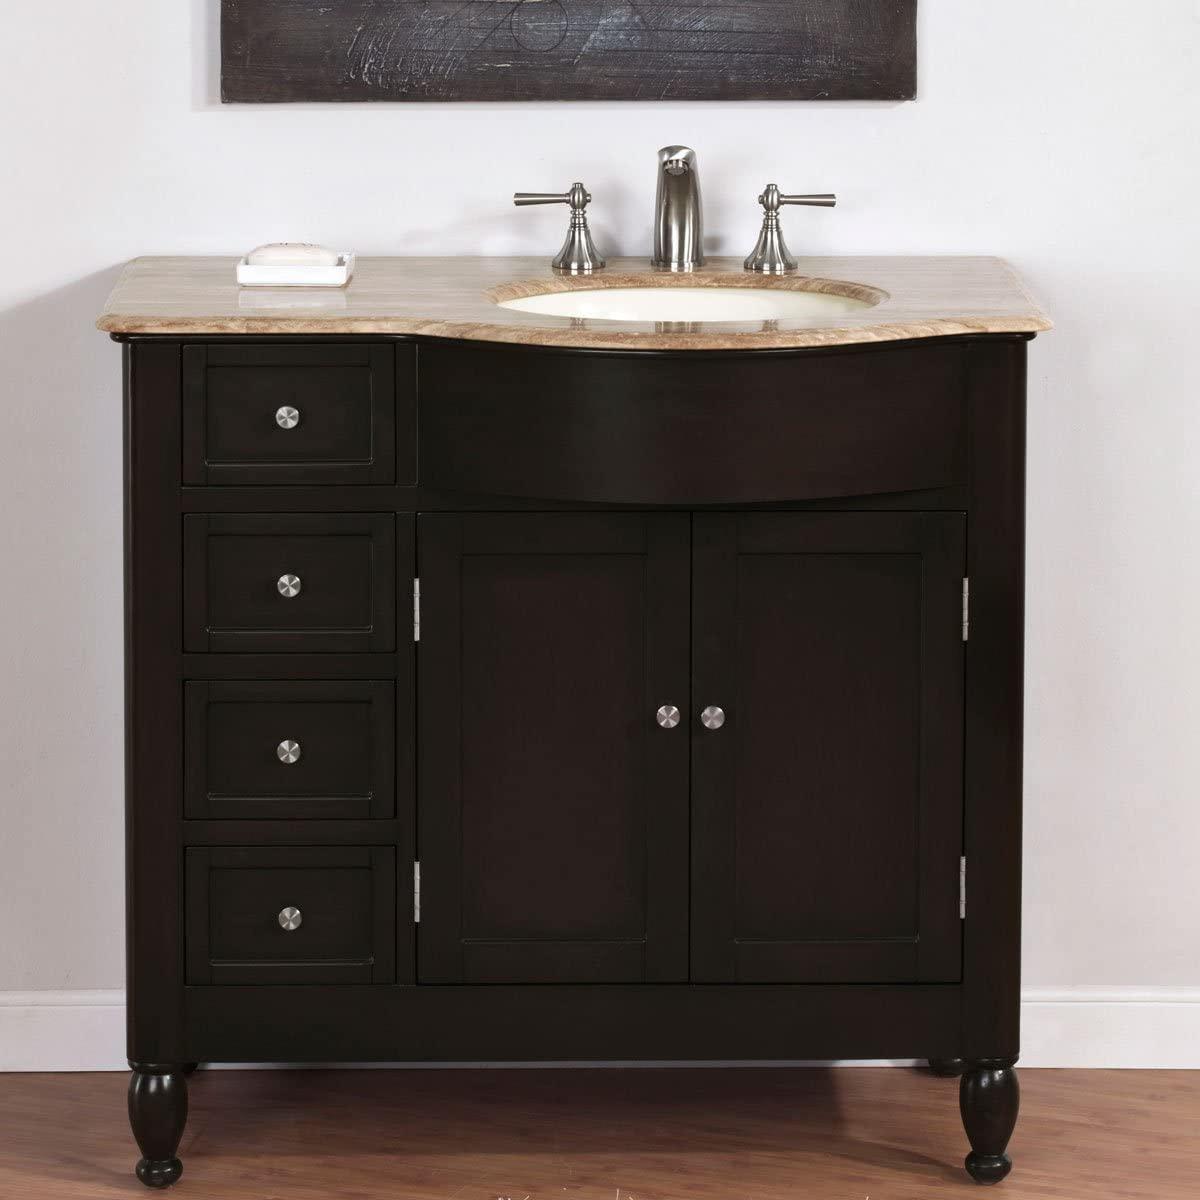 Silkroad Exclusive Single Right Sink Bathroom Vanity with Bath Furniture Cabinet